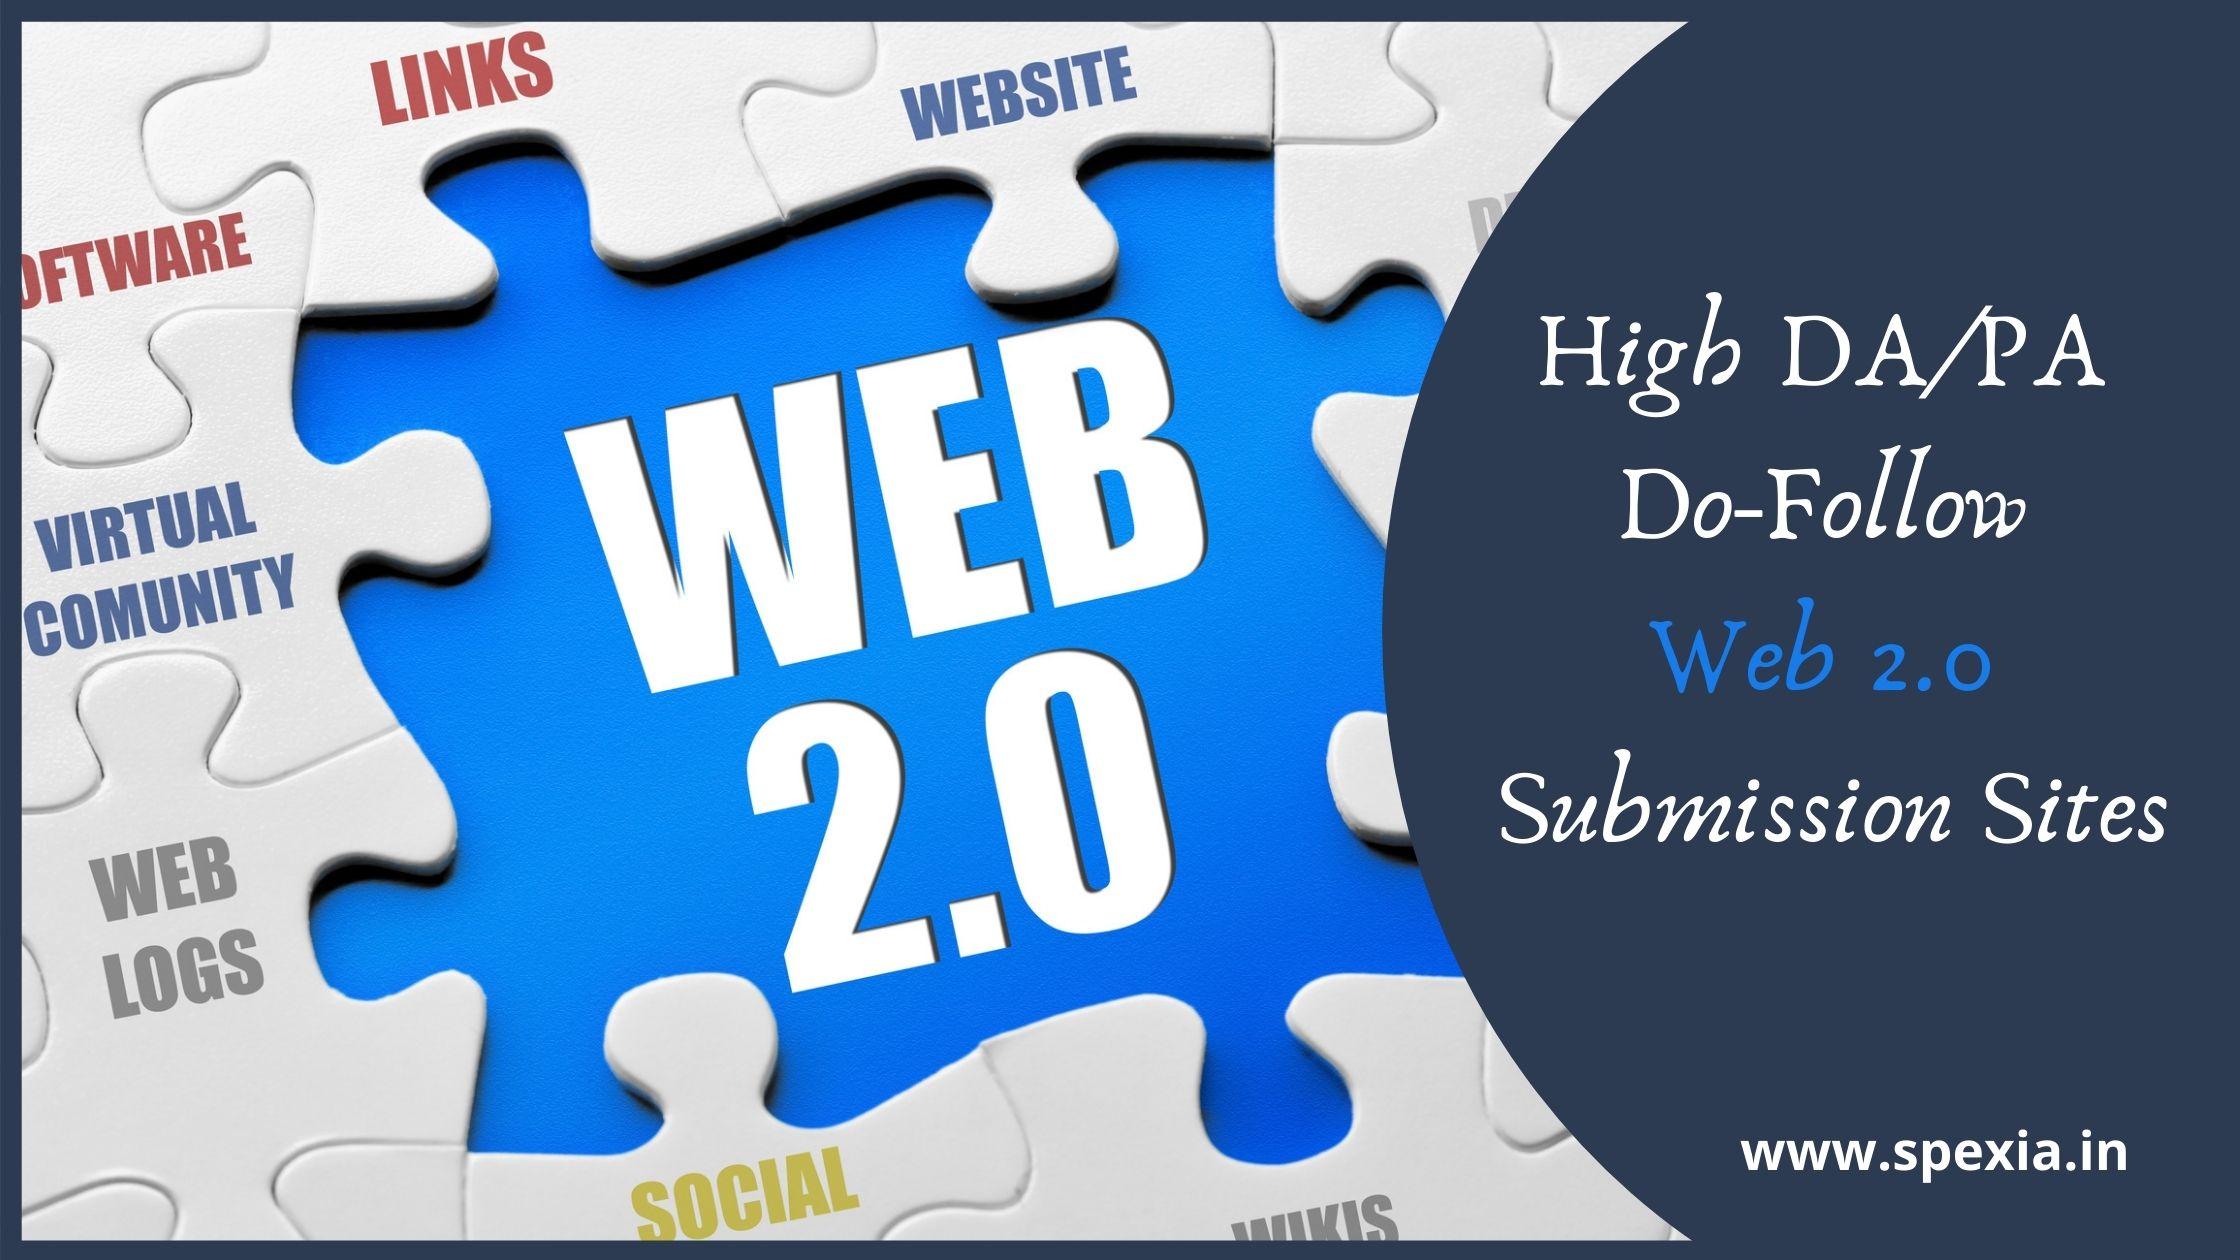 High DA/PA Do-Follow Web 2.0 submission Sites